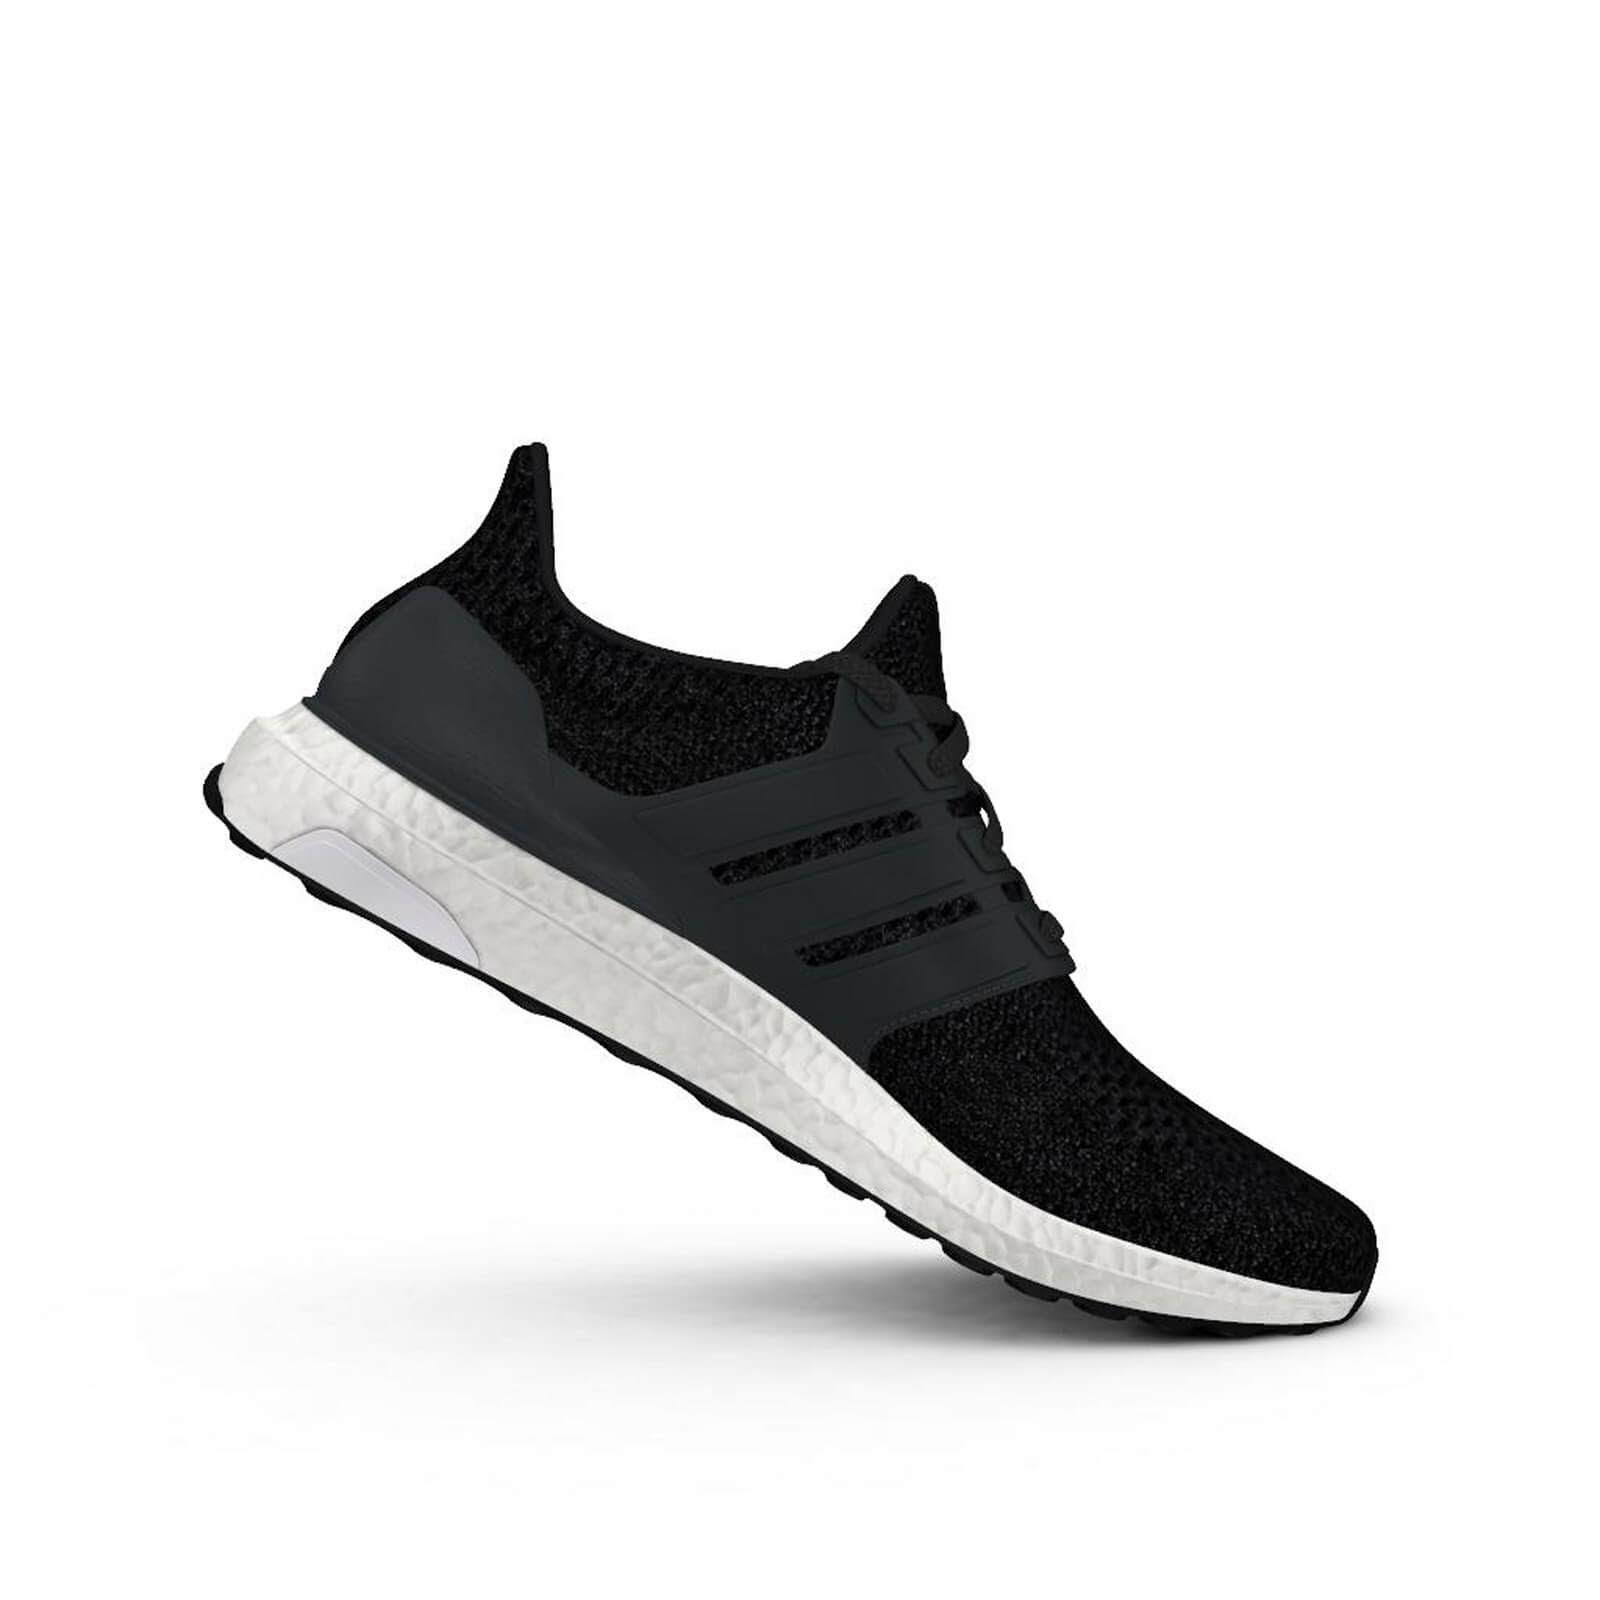 Ultraboost 5 Grey Adidas Shoes White 44 Dark Black p0dZwq